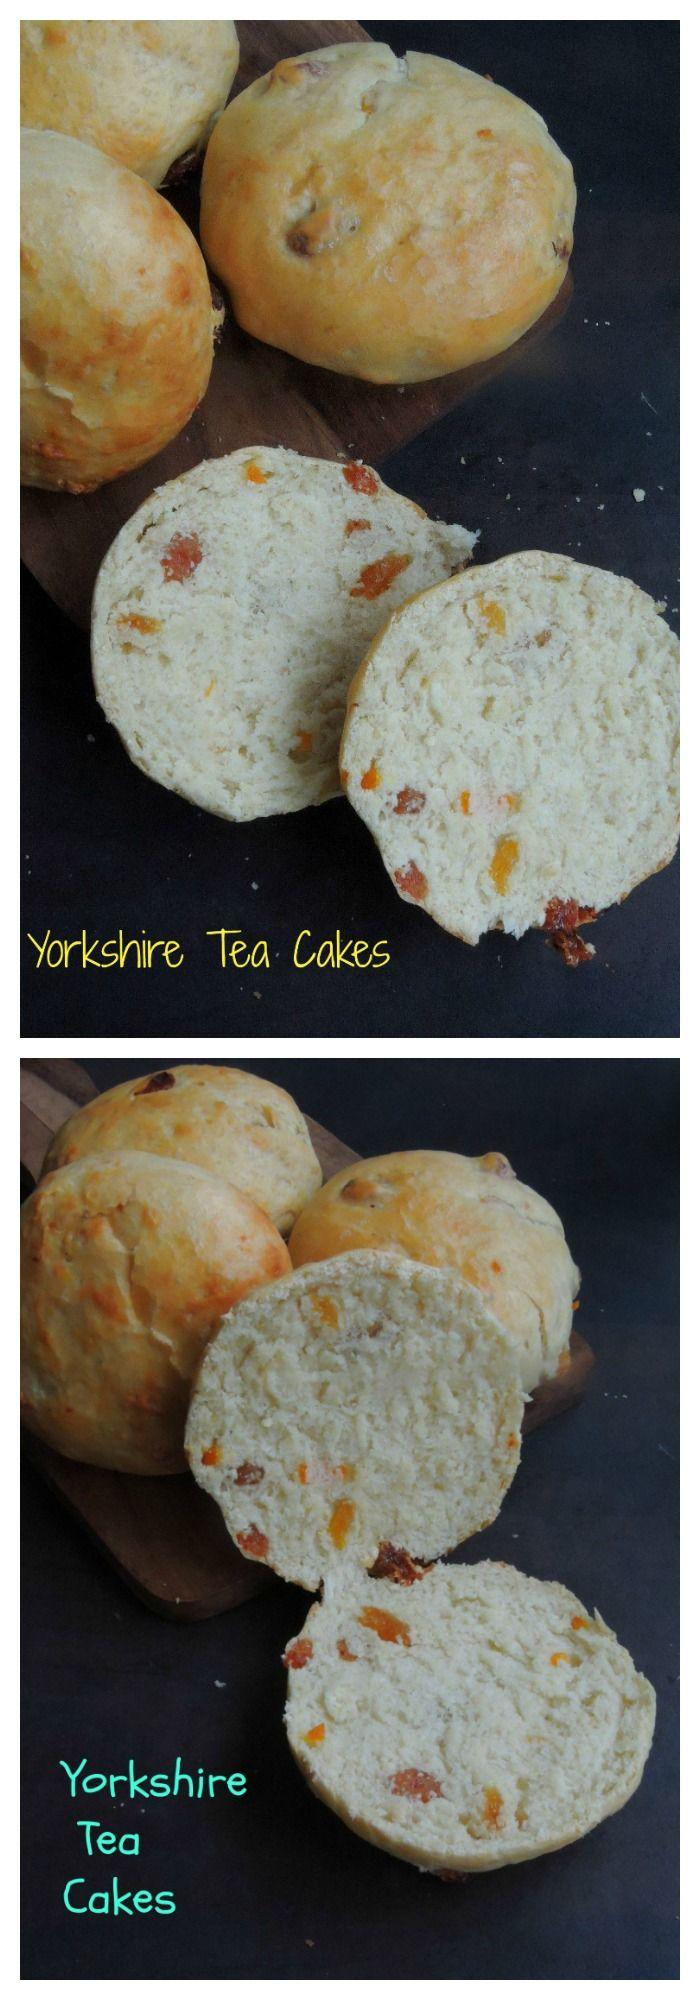 Best 25+ Yorkshire tea ideas on Pinterest | English tea time ...